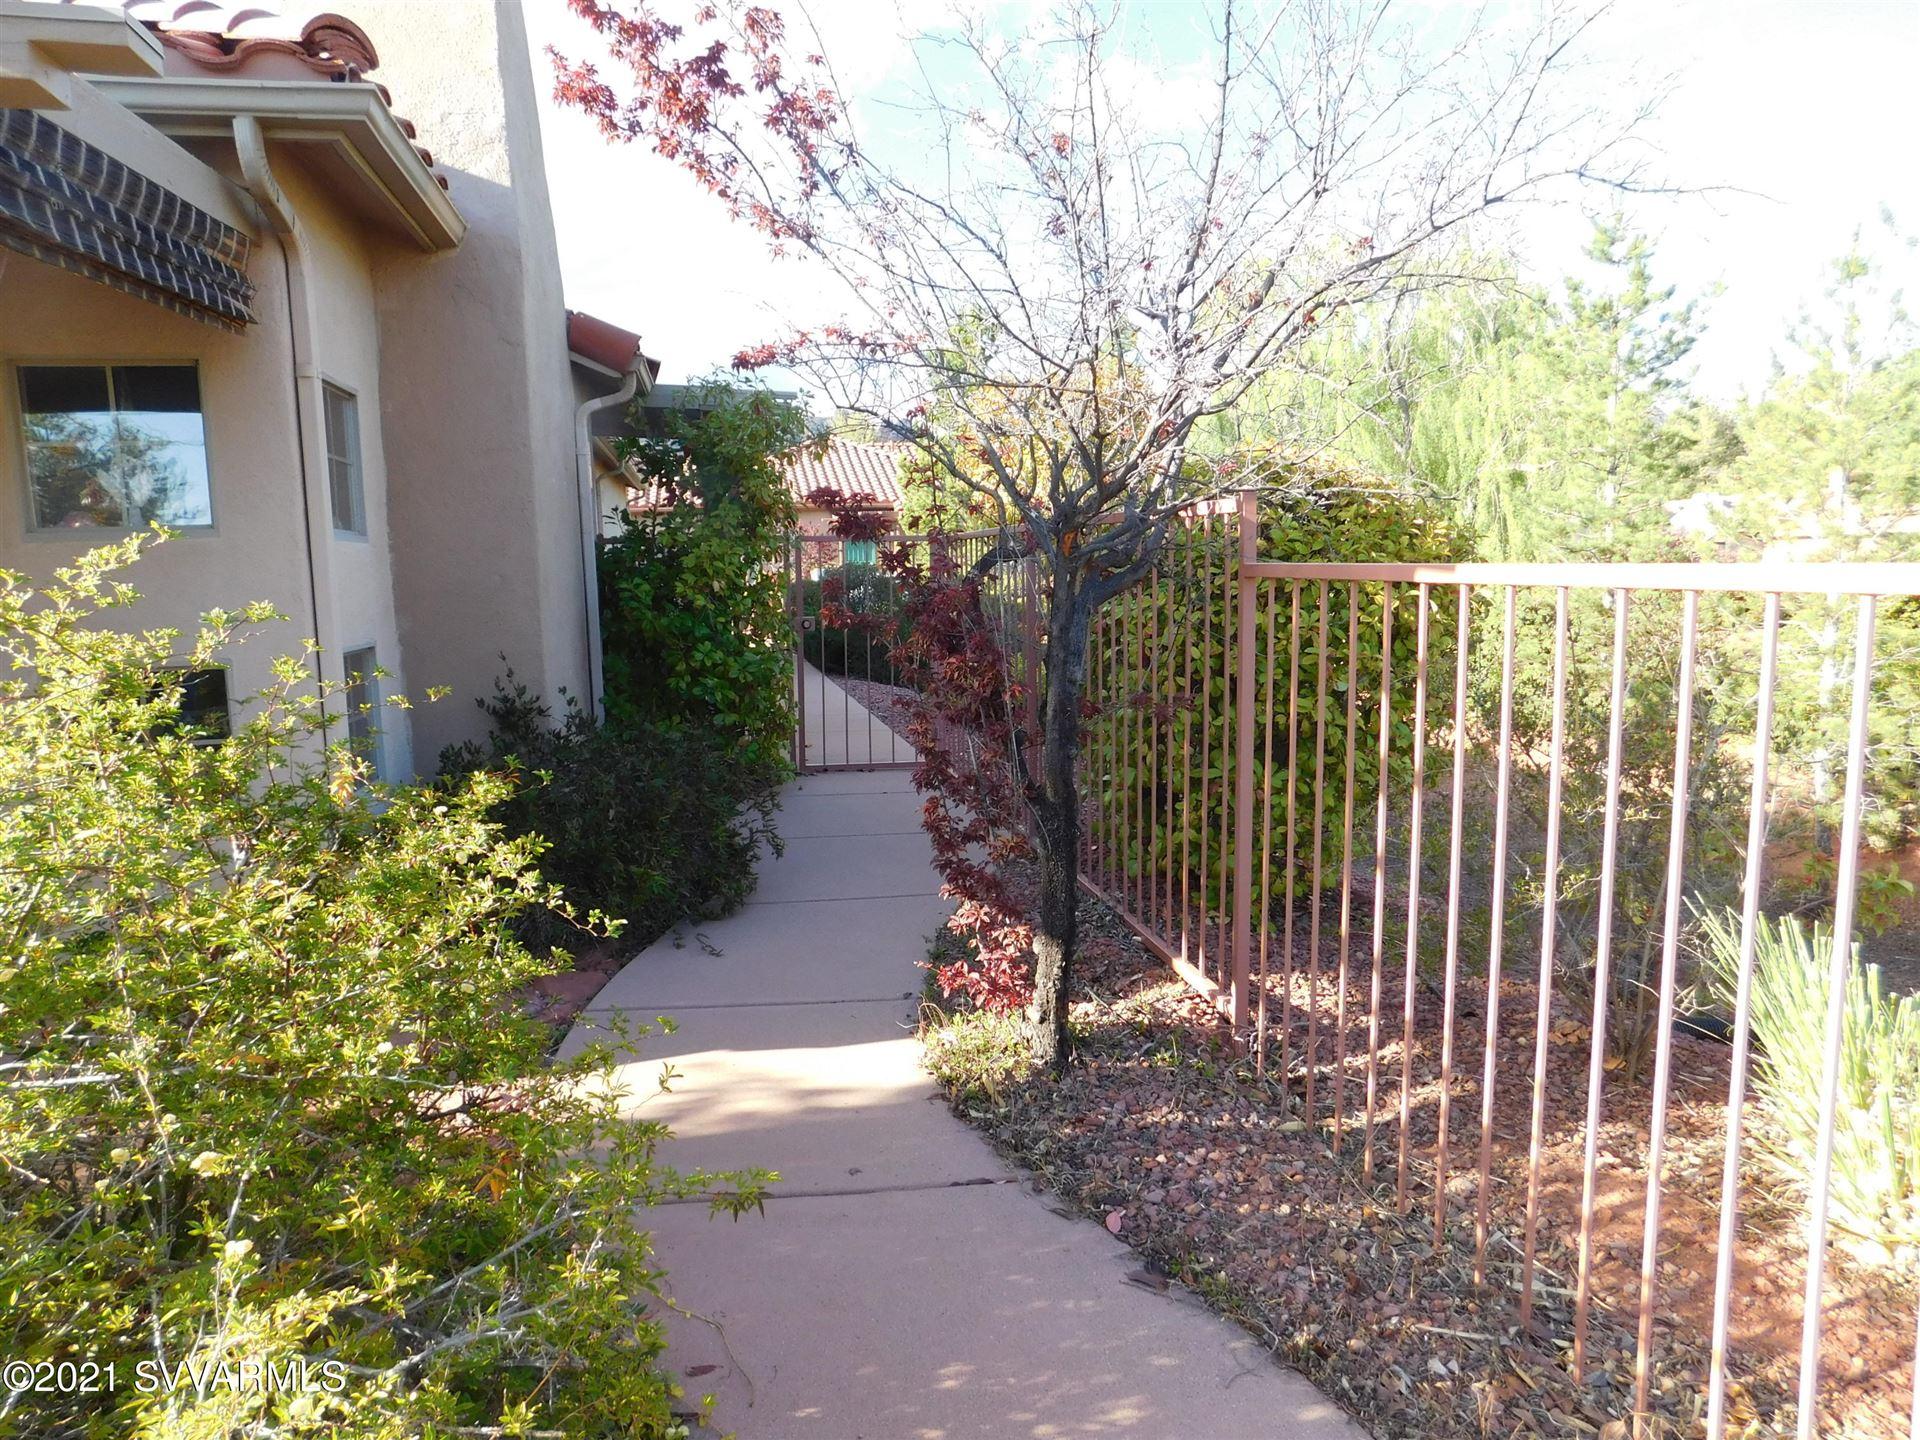 Photo of 215 Penstemon Lane, Sedona, AZ 86336 (MLS # 526076)